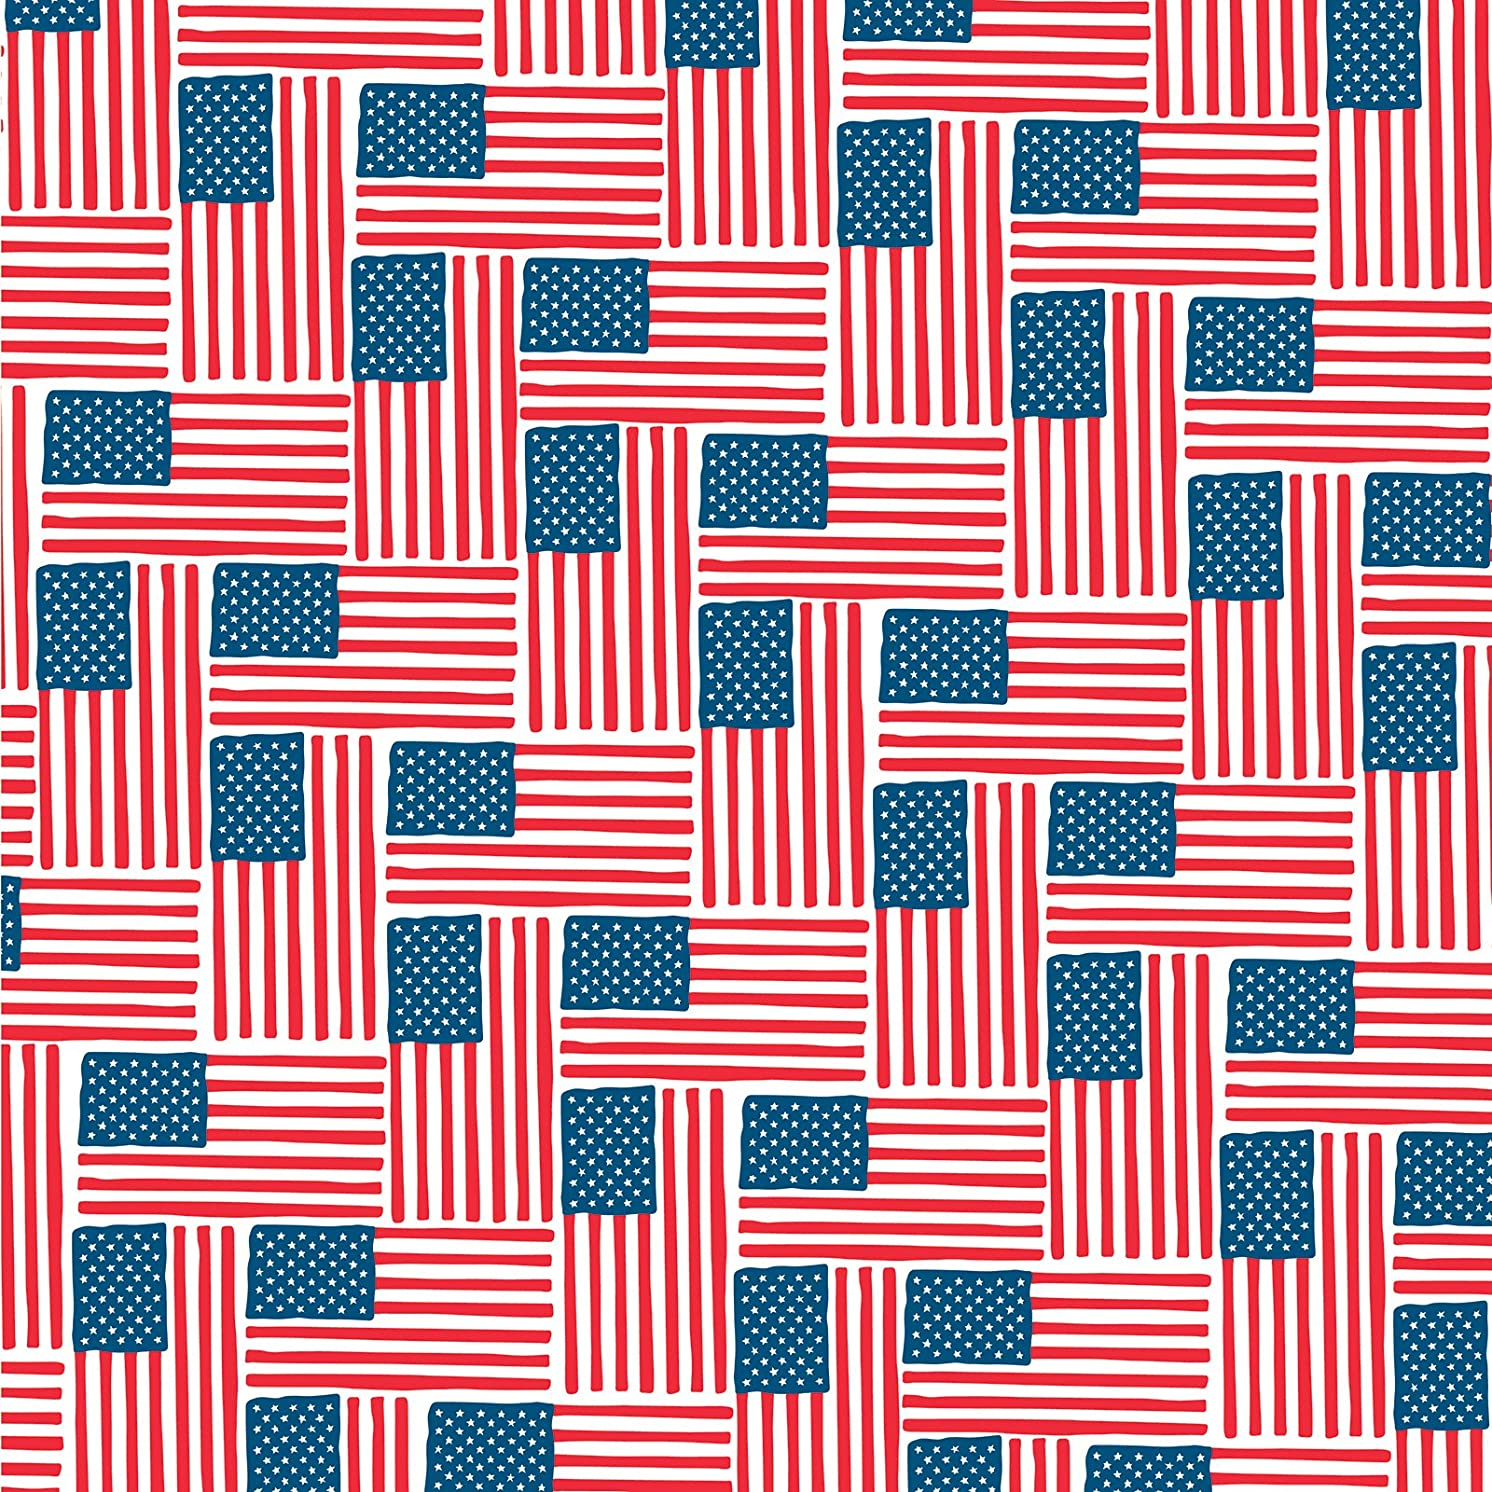 American Crafts 341398 12 x 12 Patriotic Flags Paper (25 Pack), Multicolor